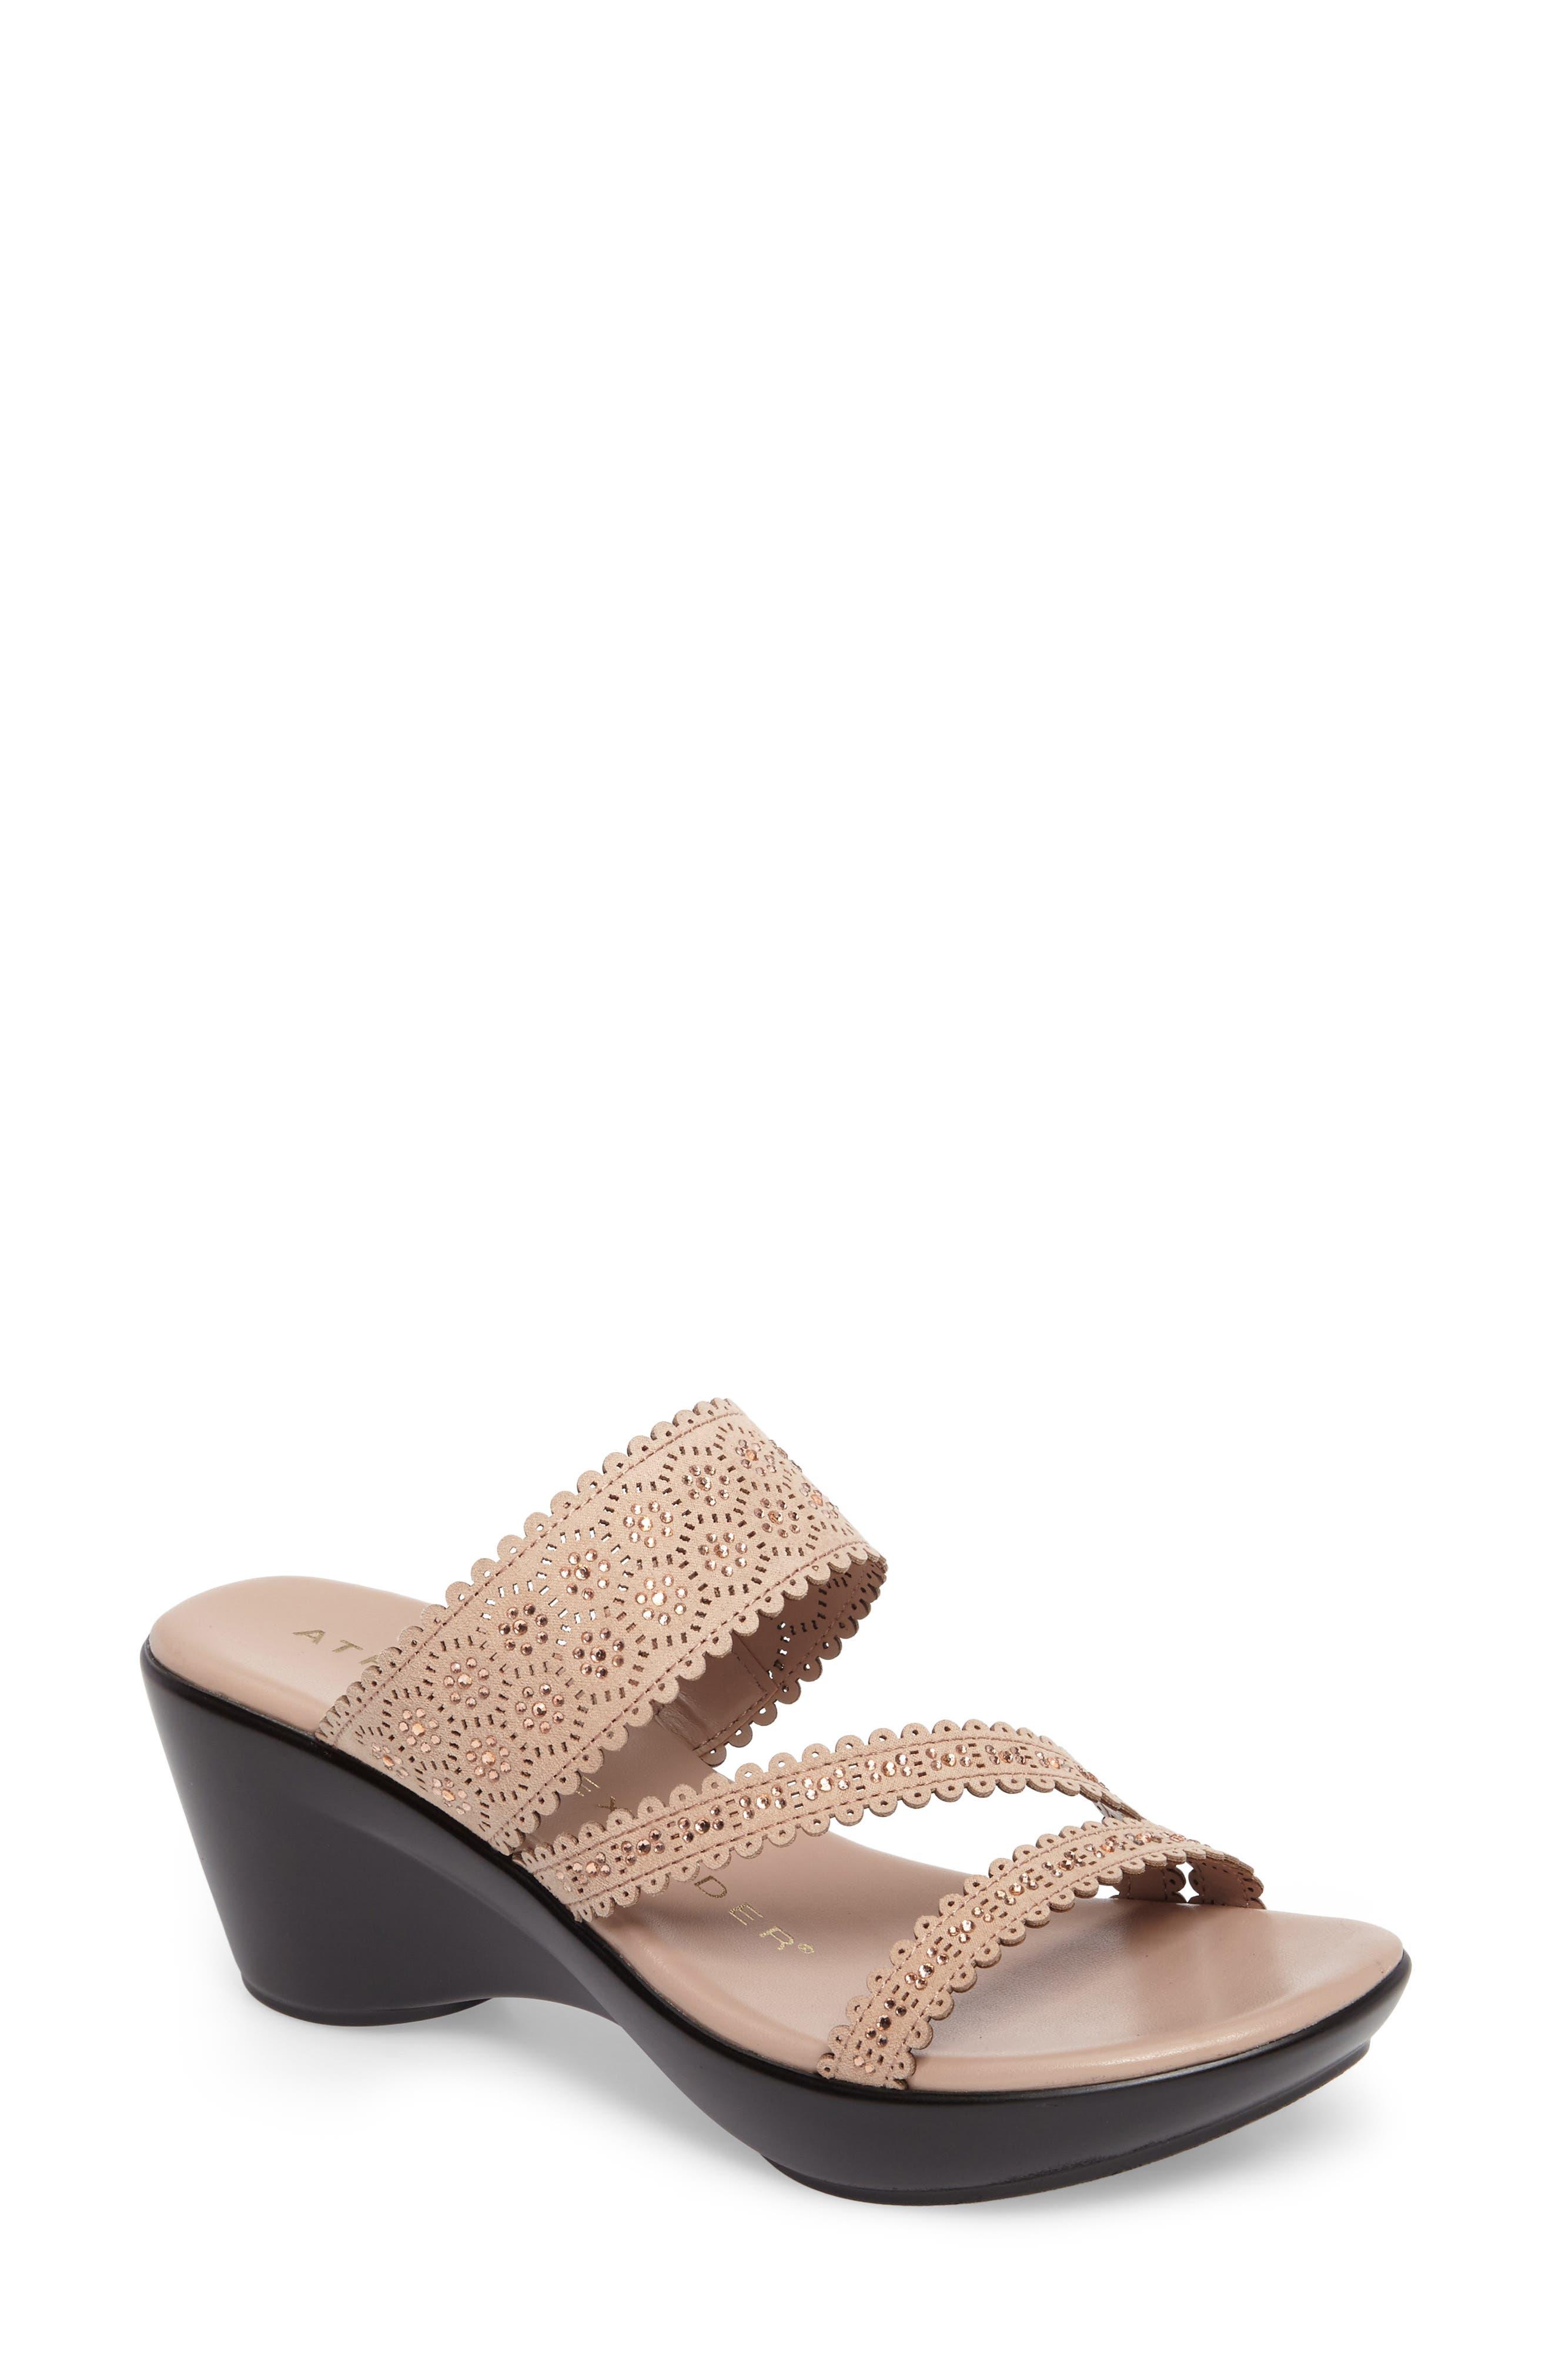 Athena Alexander Poppy Wedge Sandal (Women)